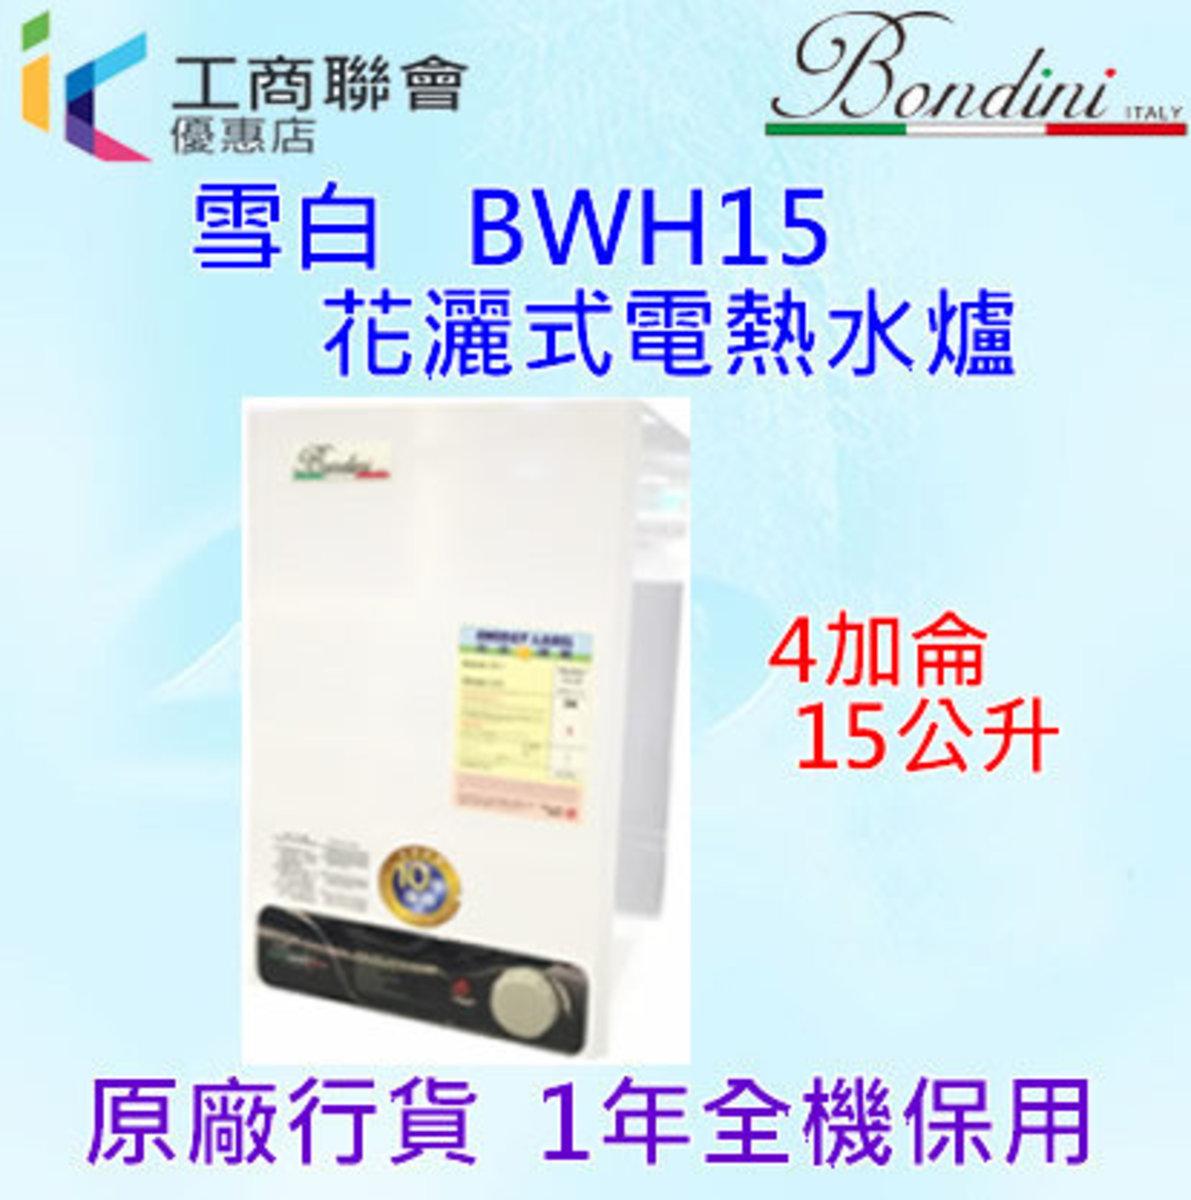 Bondini BWH15 shower type electric water heater